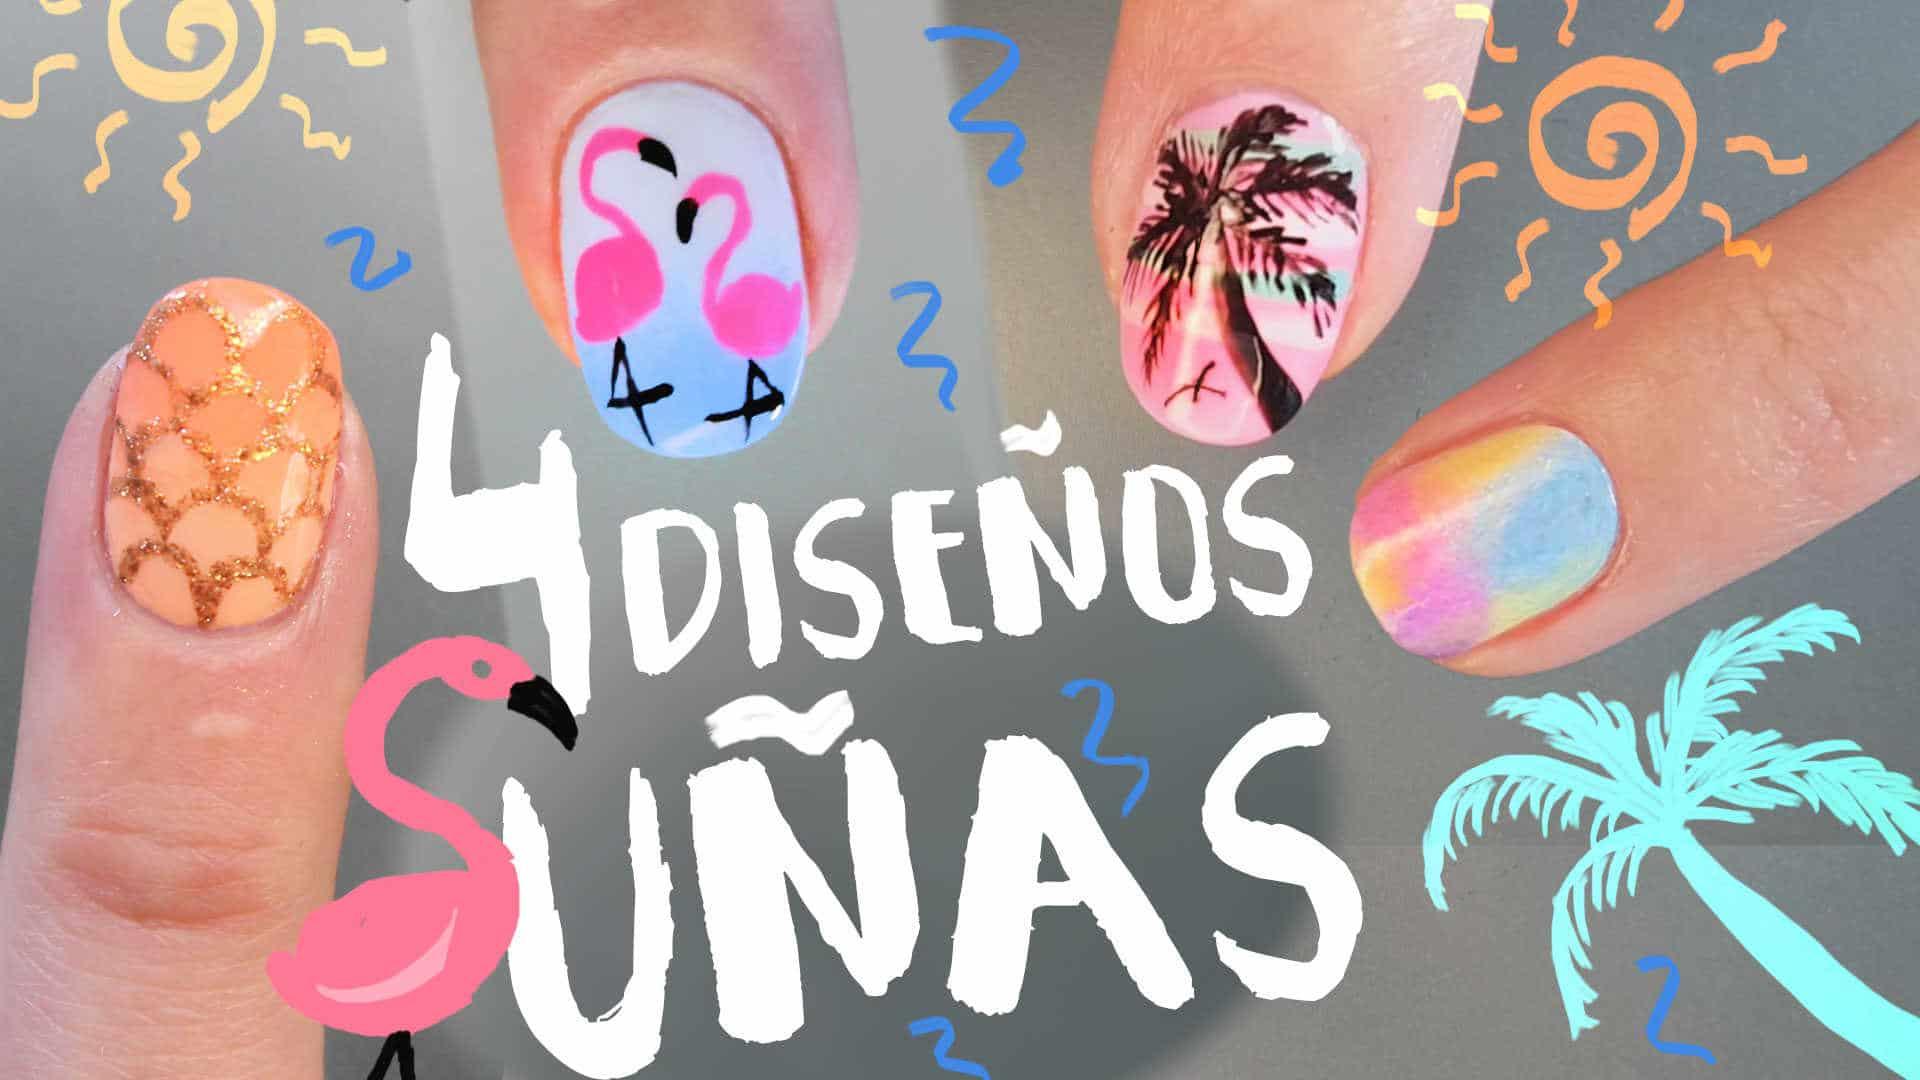 DECORACIÓN DE UÑAS: 4 IDEAS LINDAS PASO A PASO - Nailistas ...